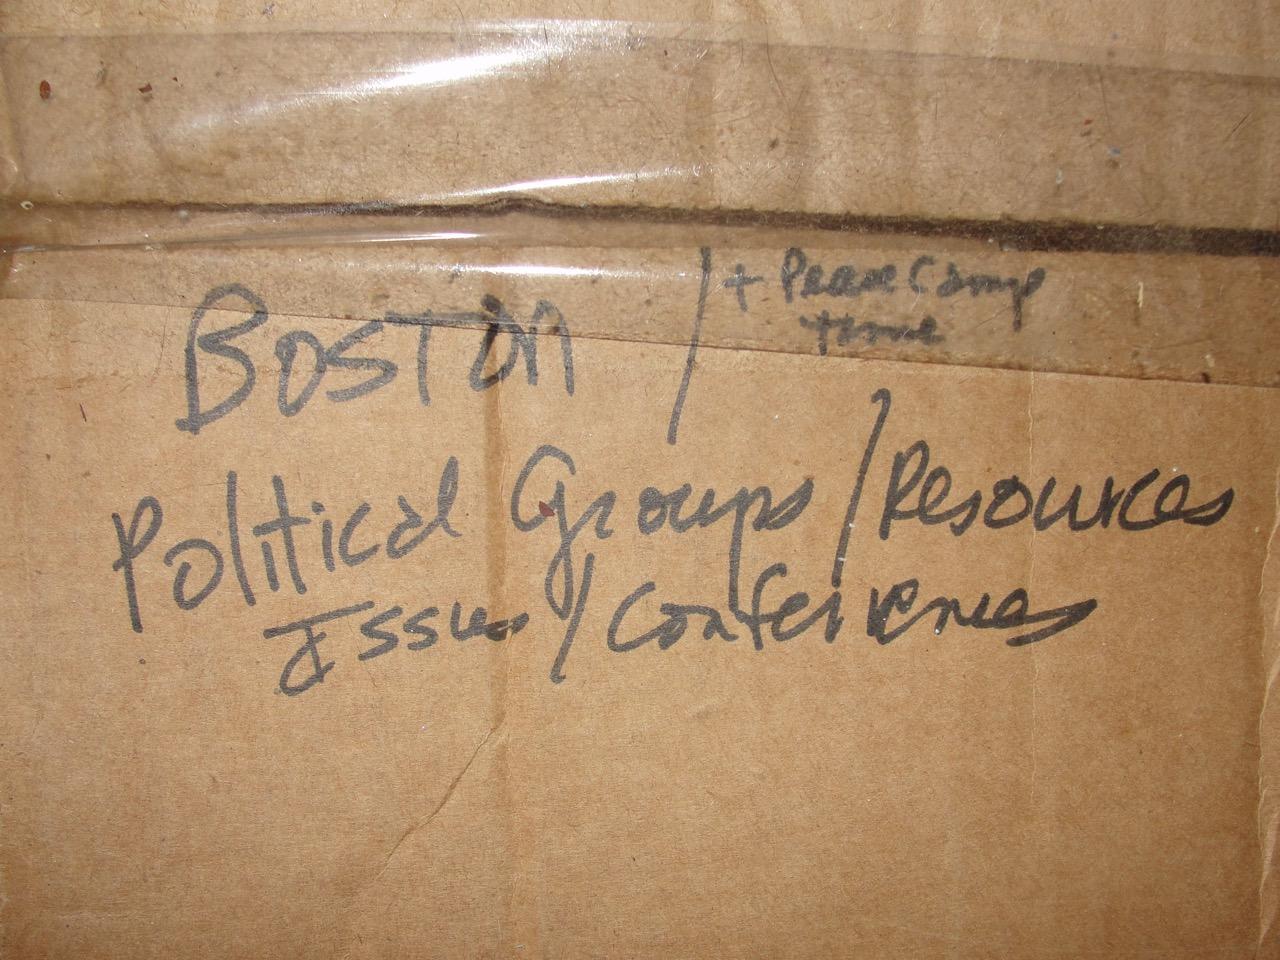 Boston Political work